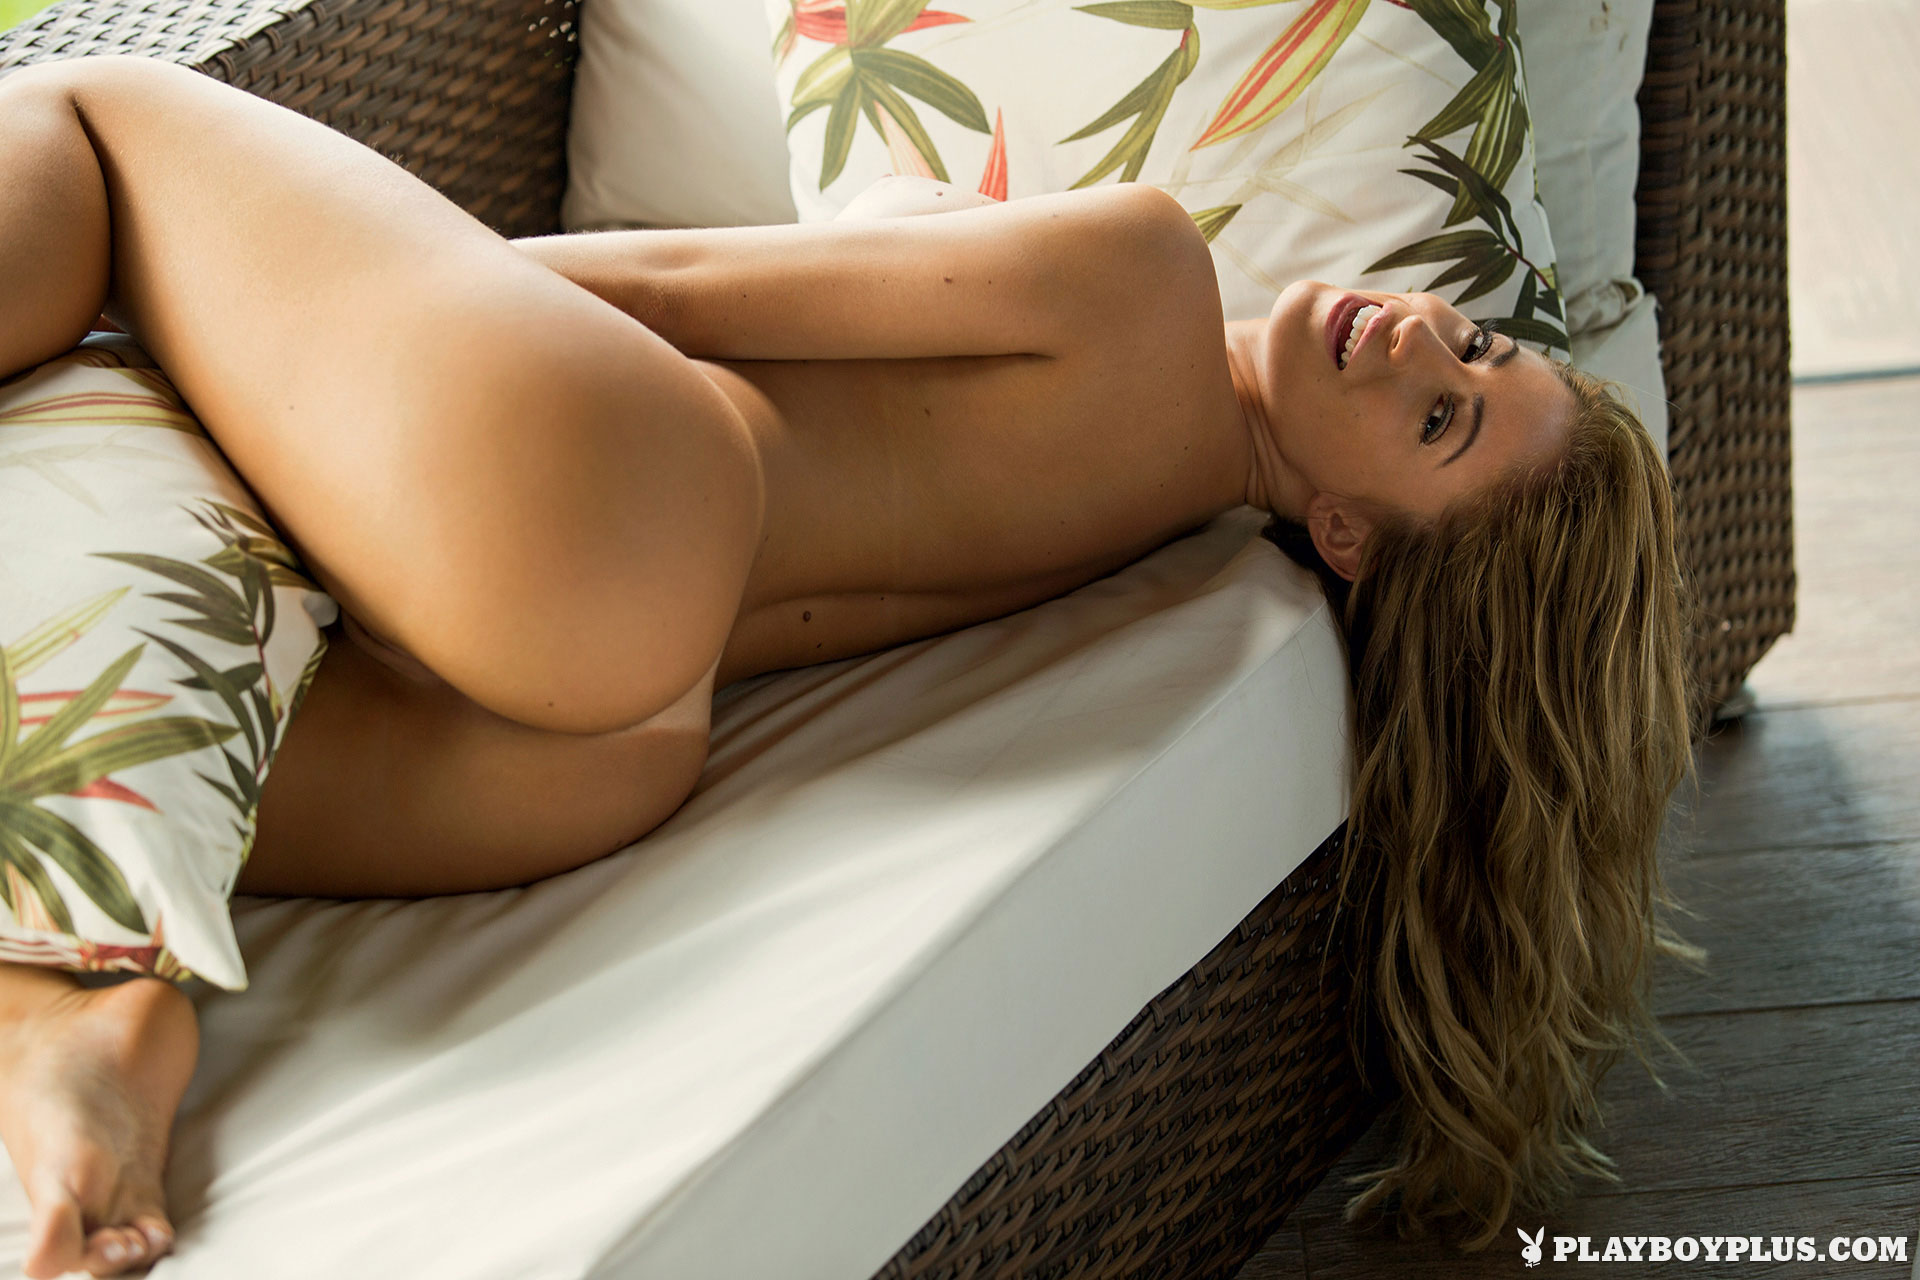 ADULT Delta Goodrem Sex nude Poll hannah ferguson vs maria menounos,Toni Garrn Legs